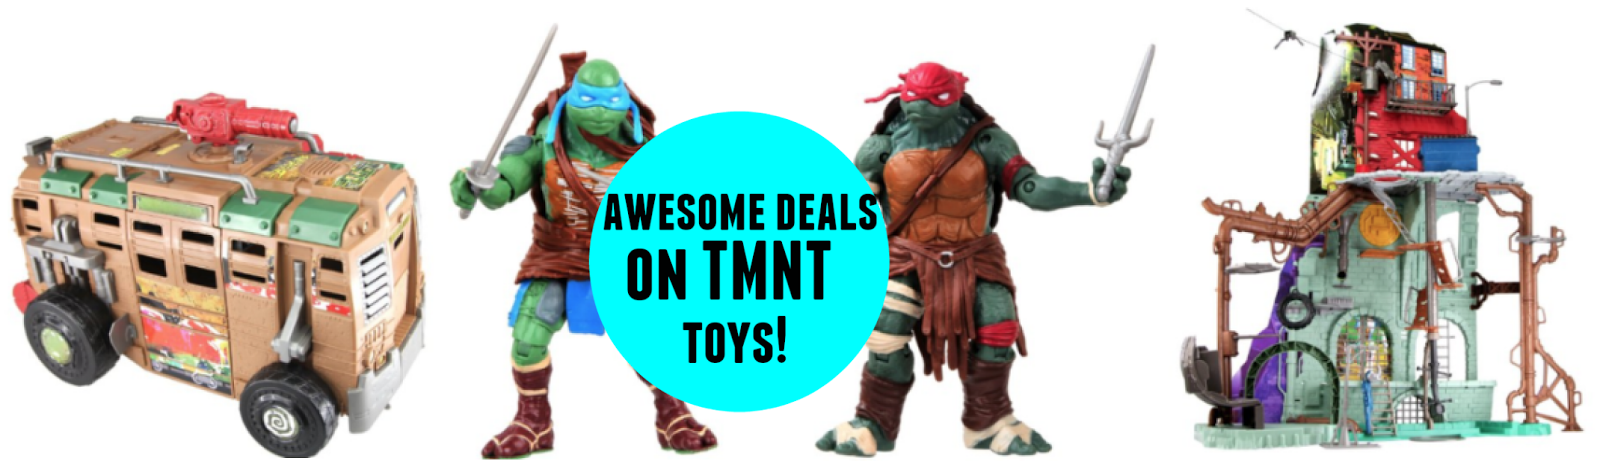 http://www.thebinderladies.com/2014/11/awesome-deals-on-teenage-mutant-ninja.html#.VFf3W77duyM